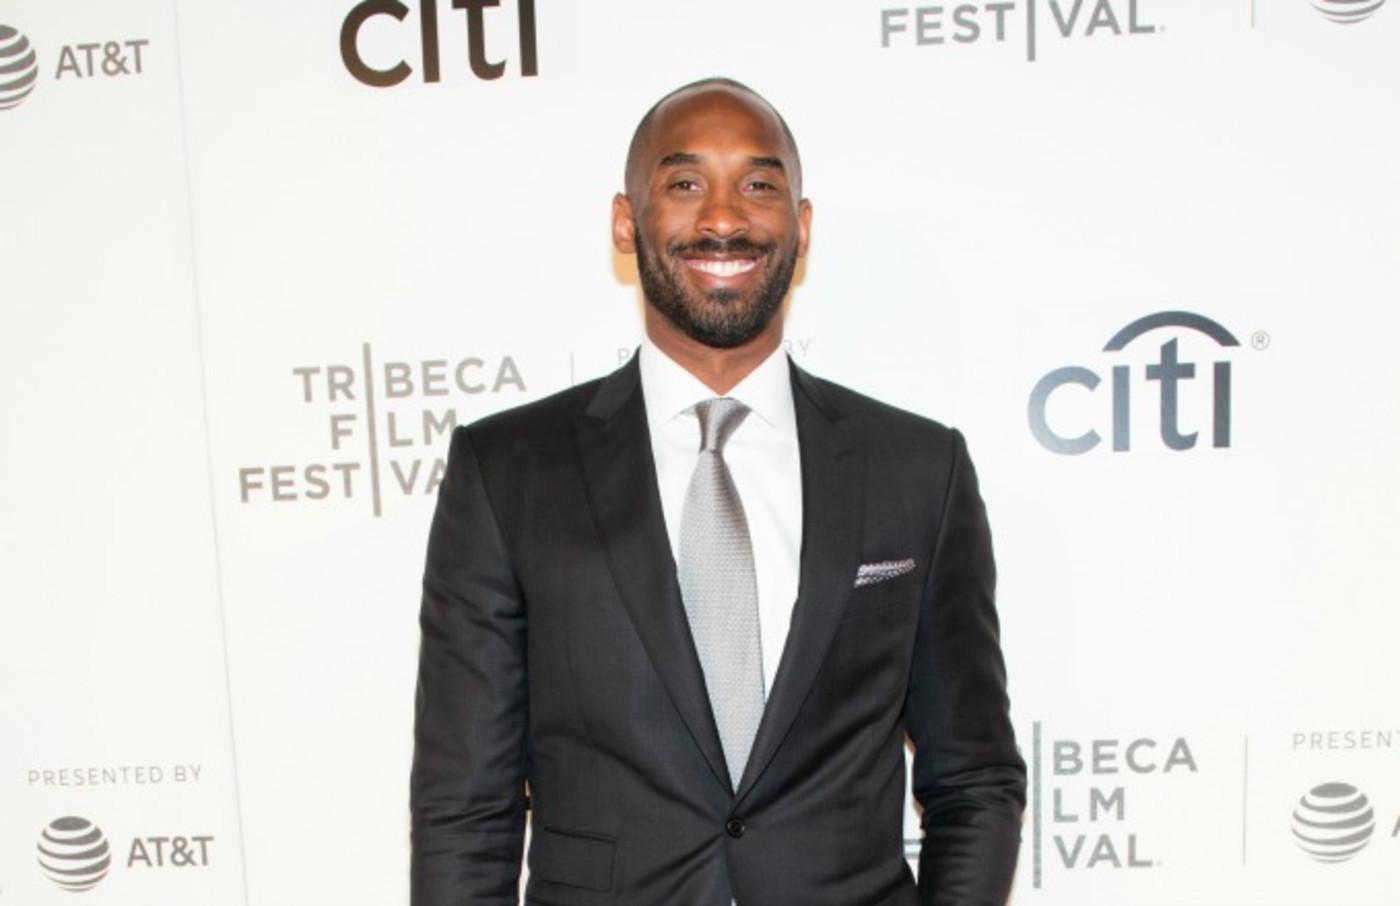 Kobe Bryant hits the red carpet at the Tribeca Film Festival.